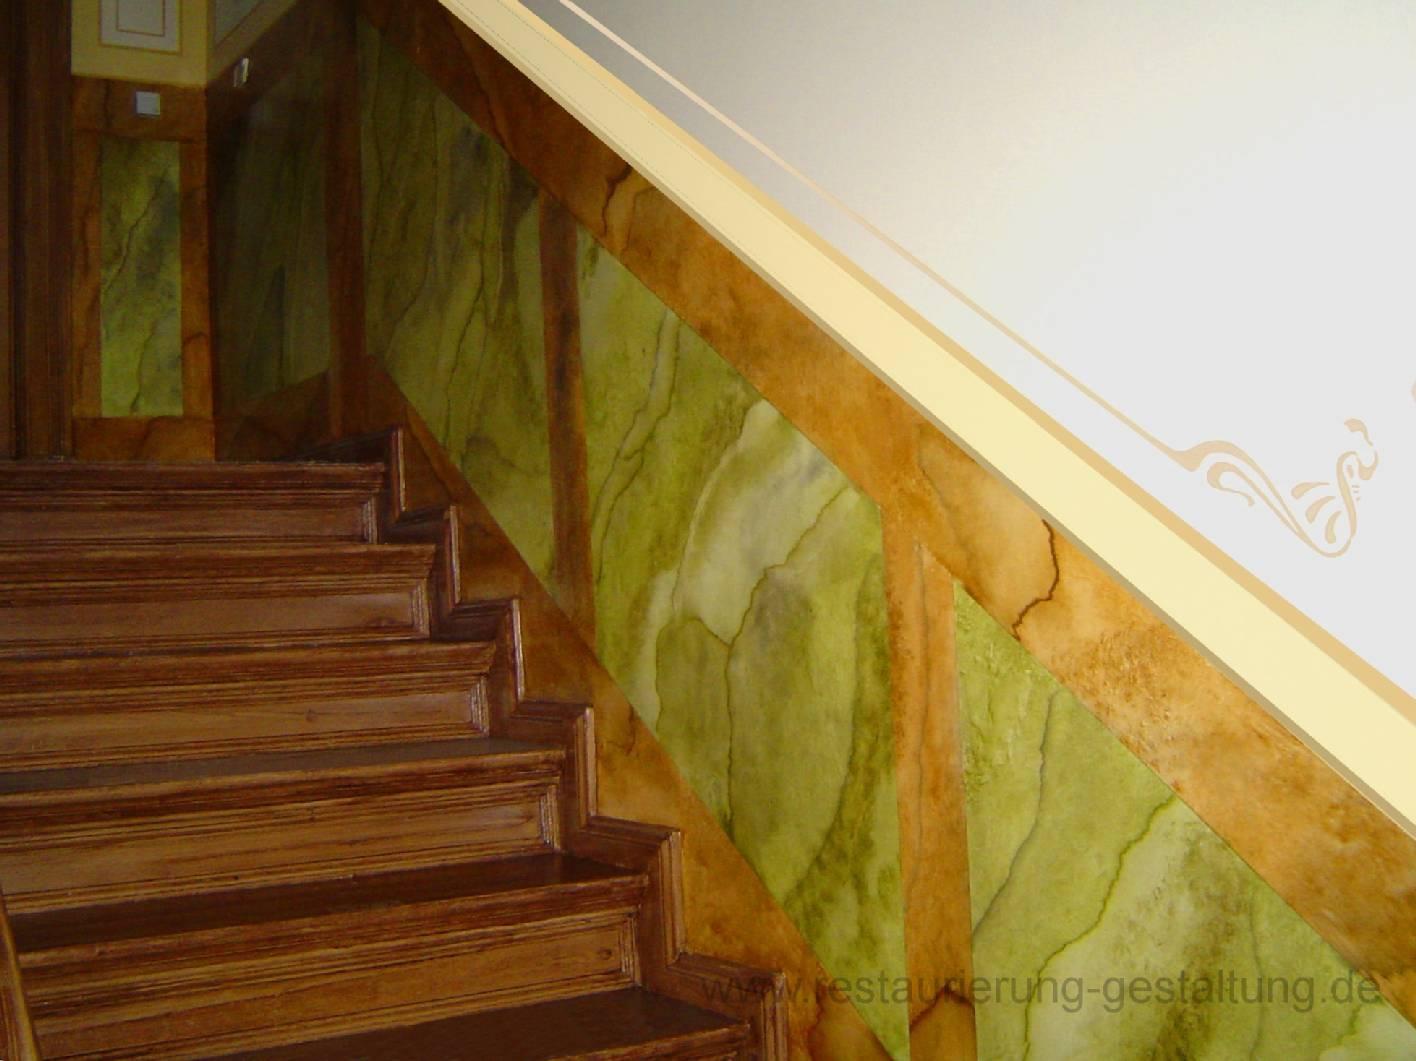 treppenhausgestaltung malermeister norbert schimpf. Black Bedroom Furniture Sets. Home Design Ideas